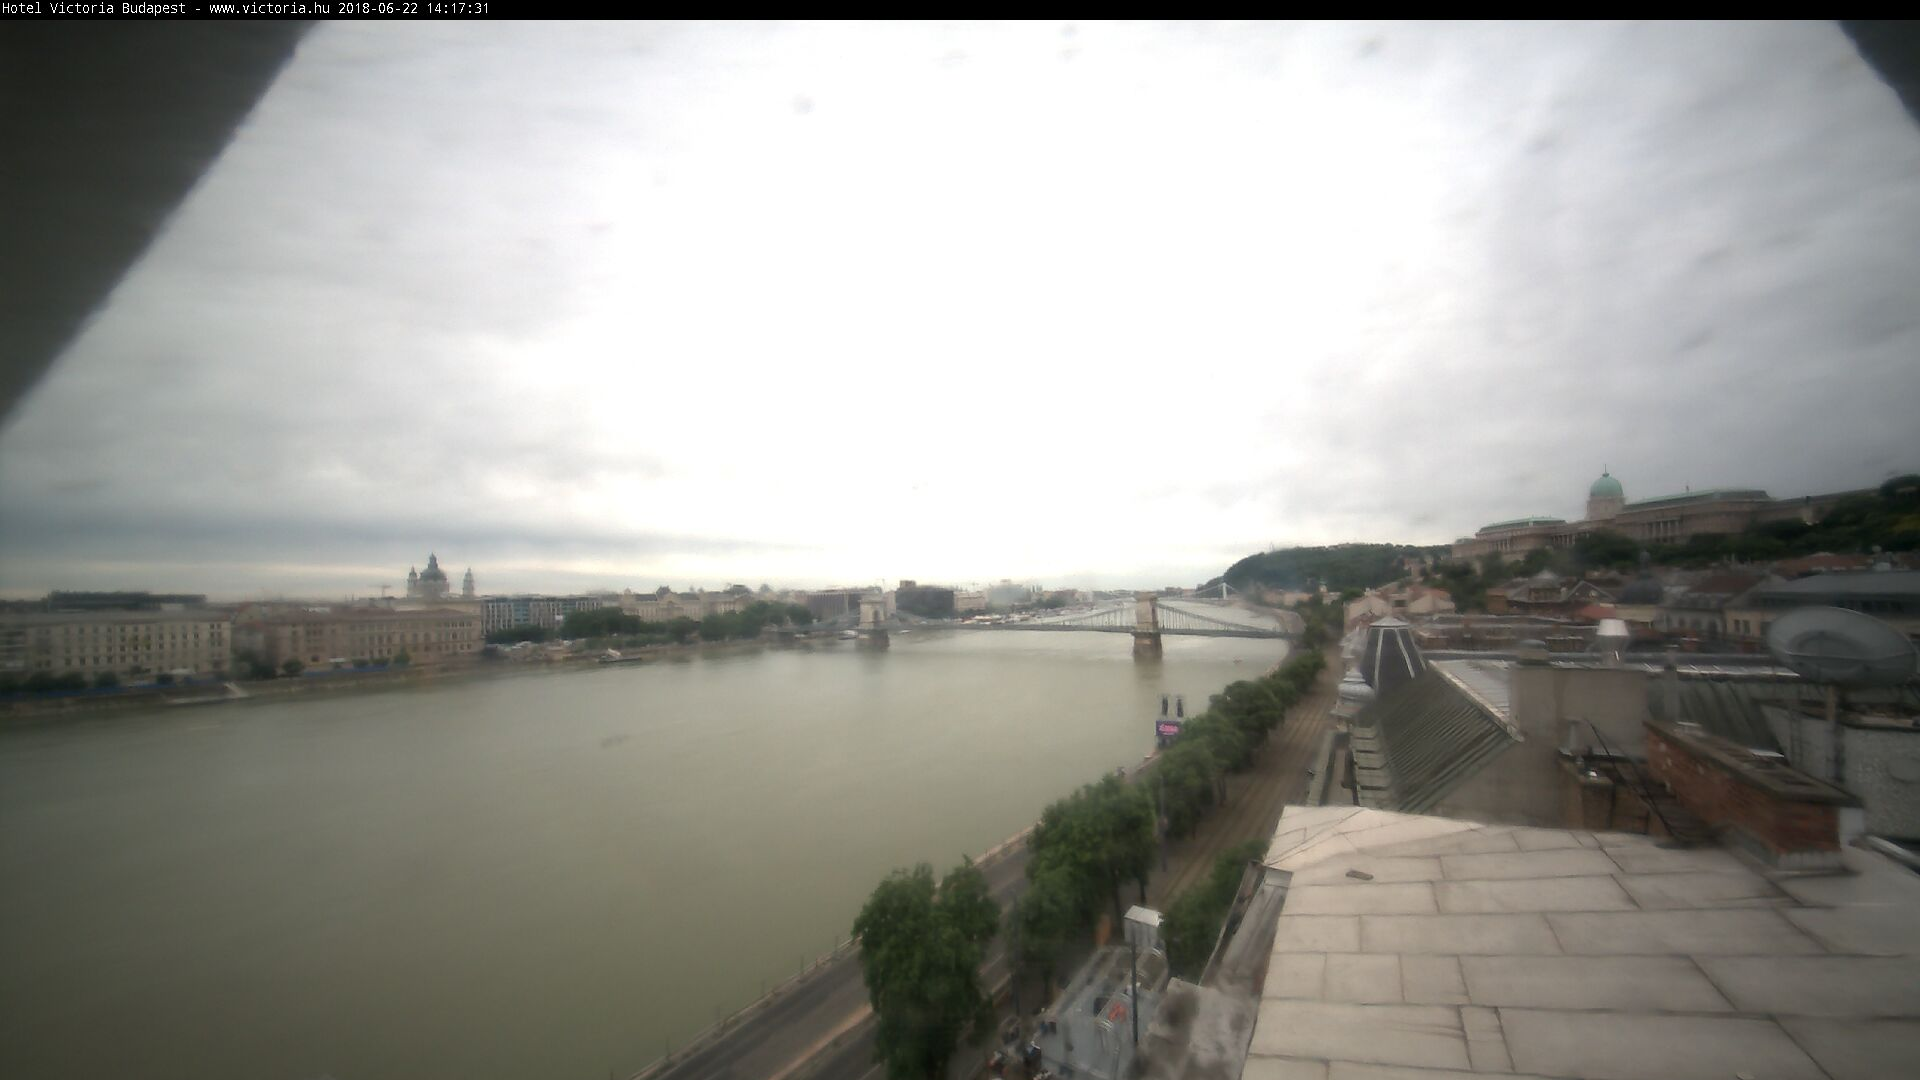 The Danube River from Hotel Victoria